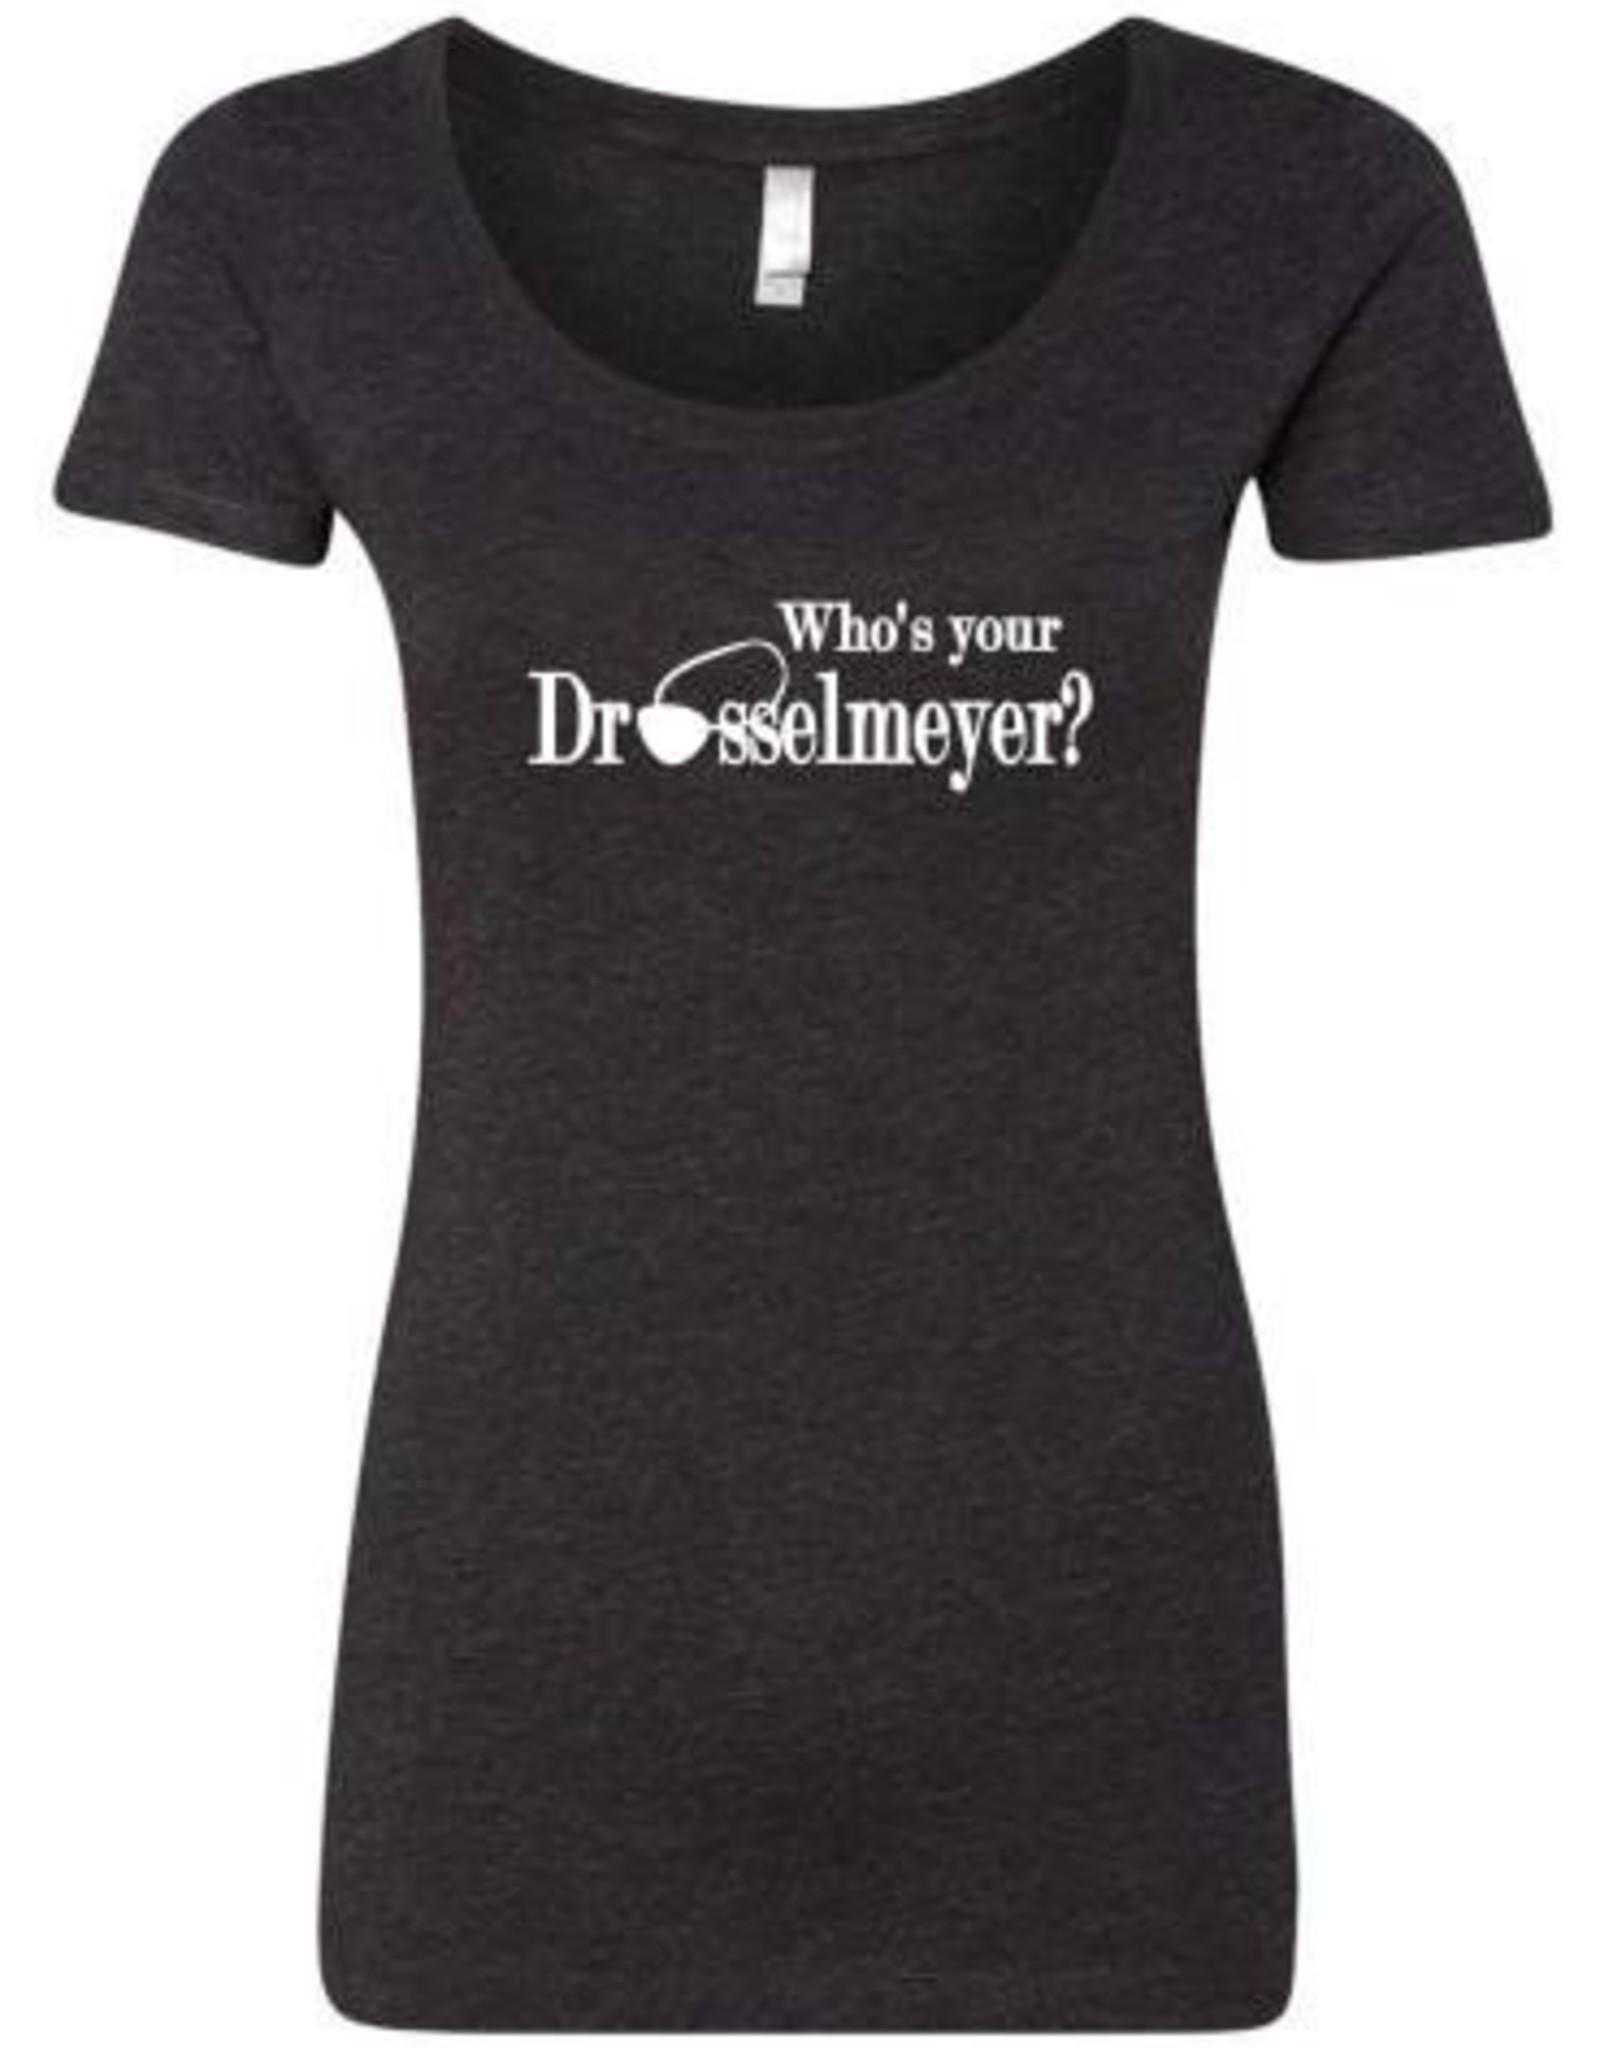 B+ Printworks 952CC76 Shirt - Who's Your Drosselmeyer?